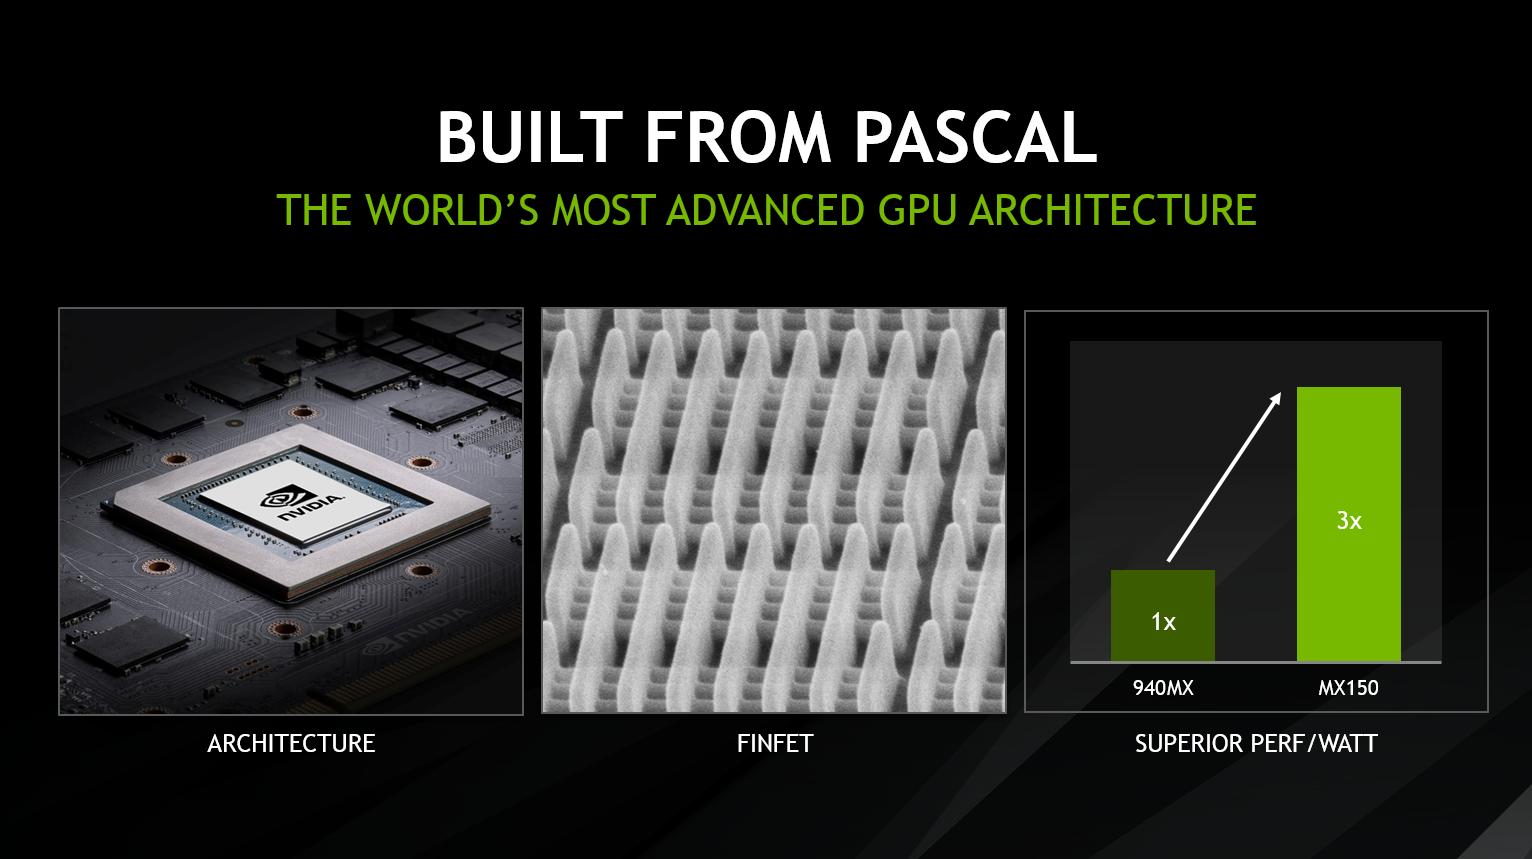 Comparison: NVIDIA GeForce MX150 vs NVIDIA GeForce 940MX